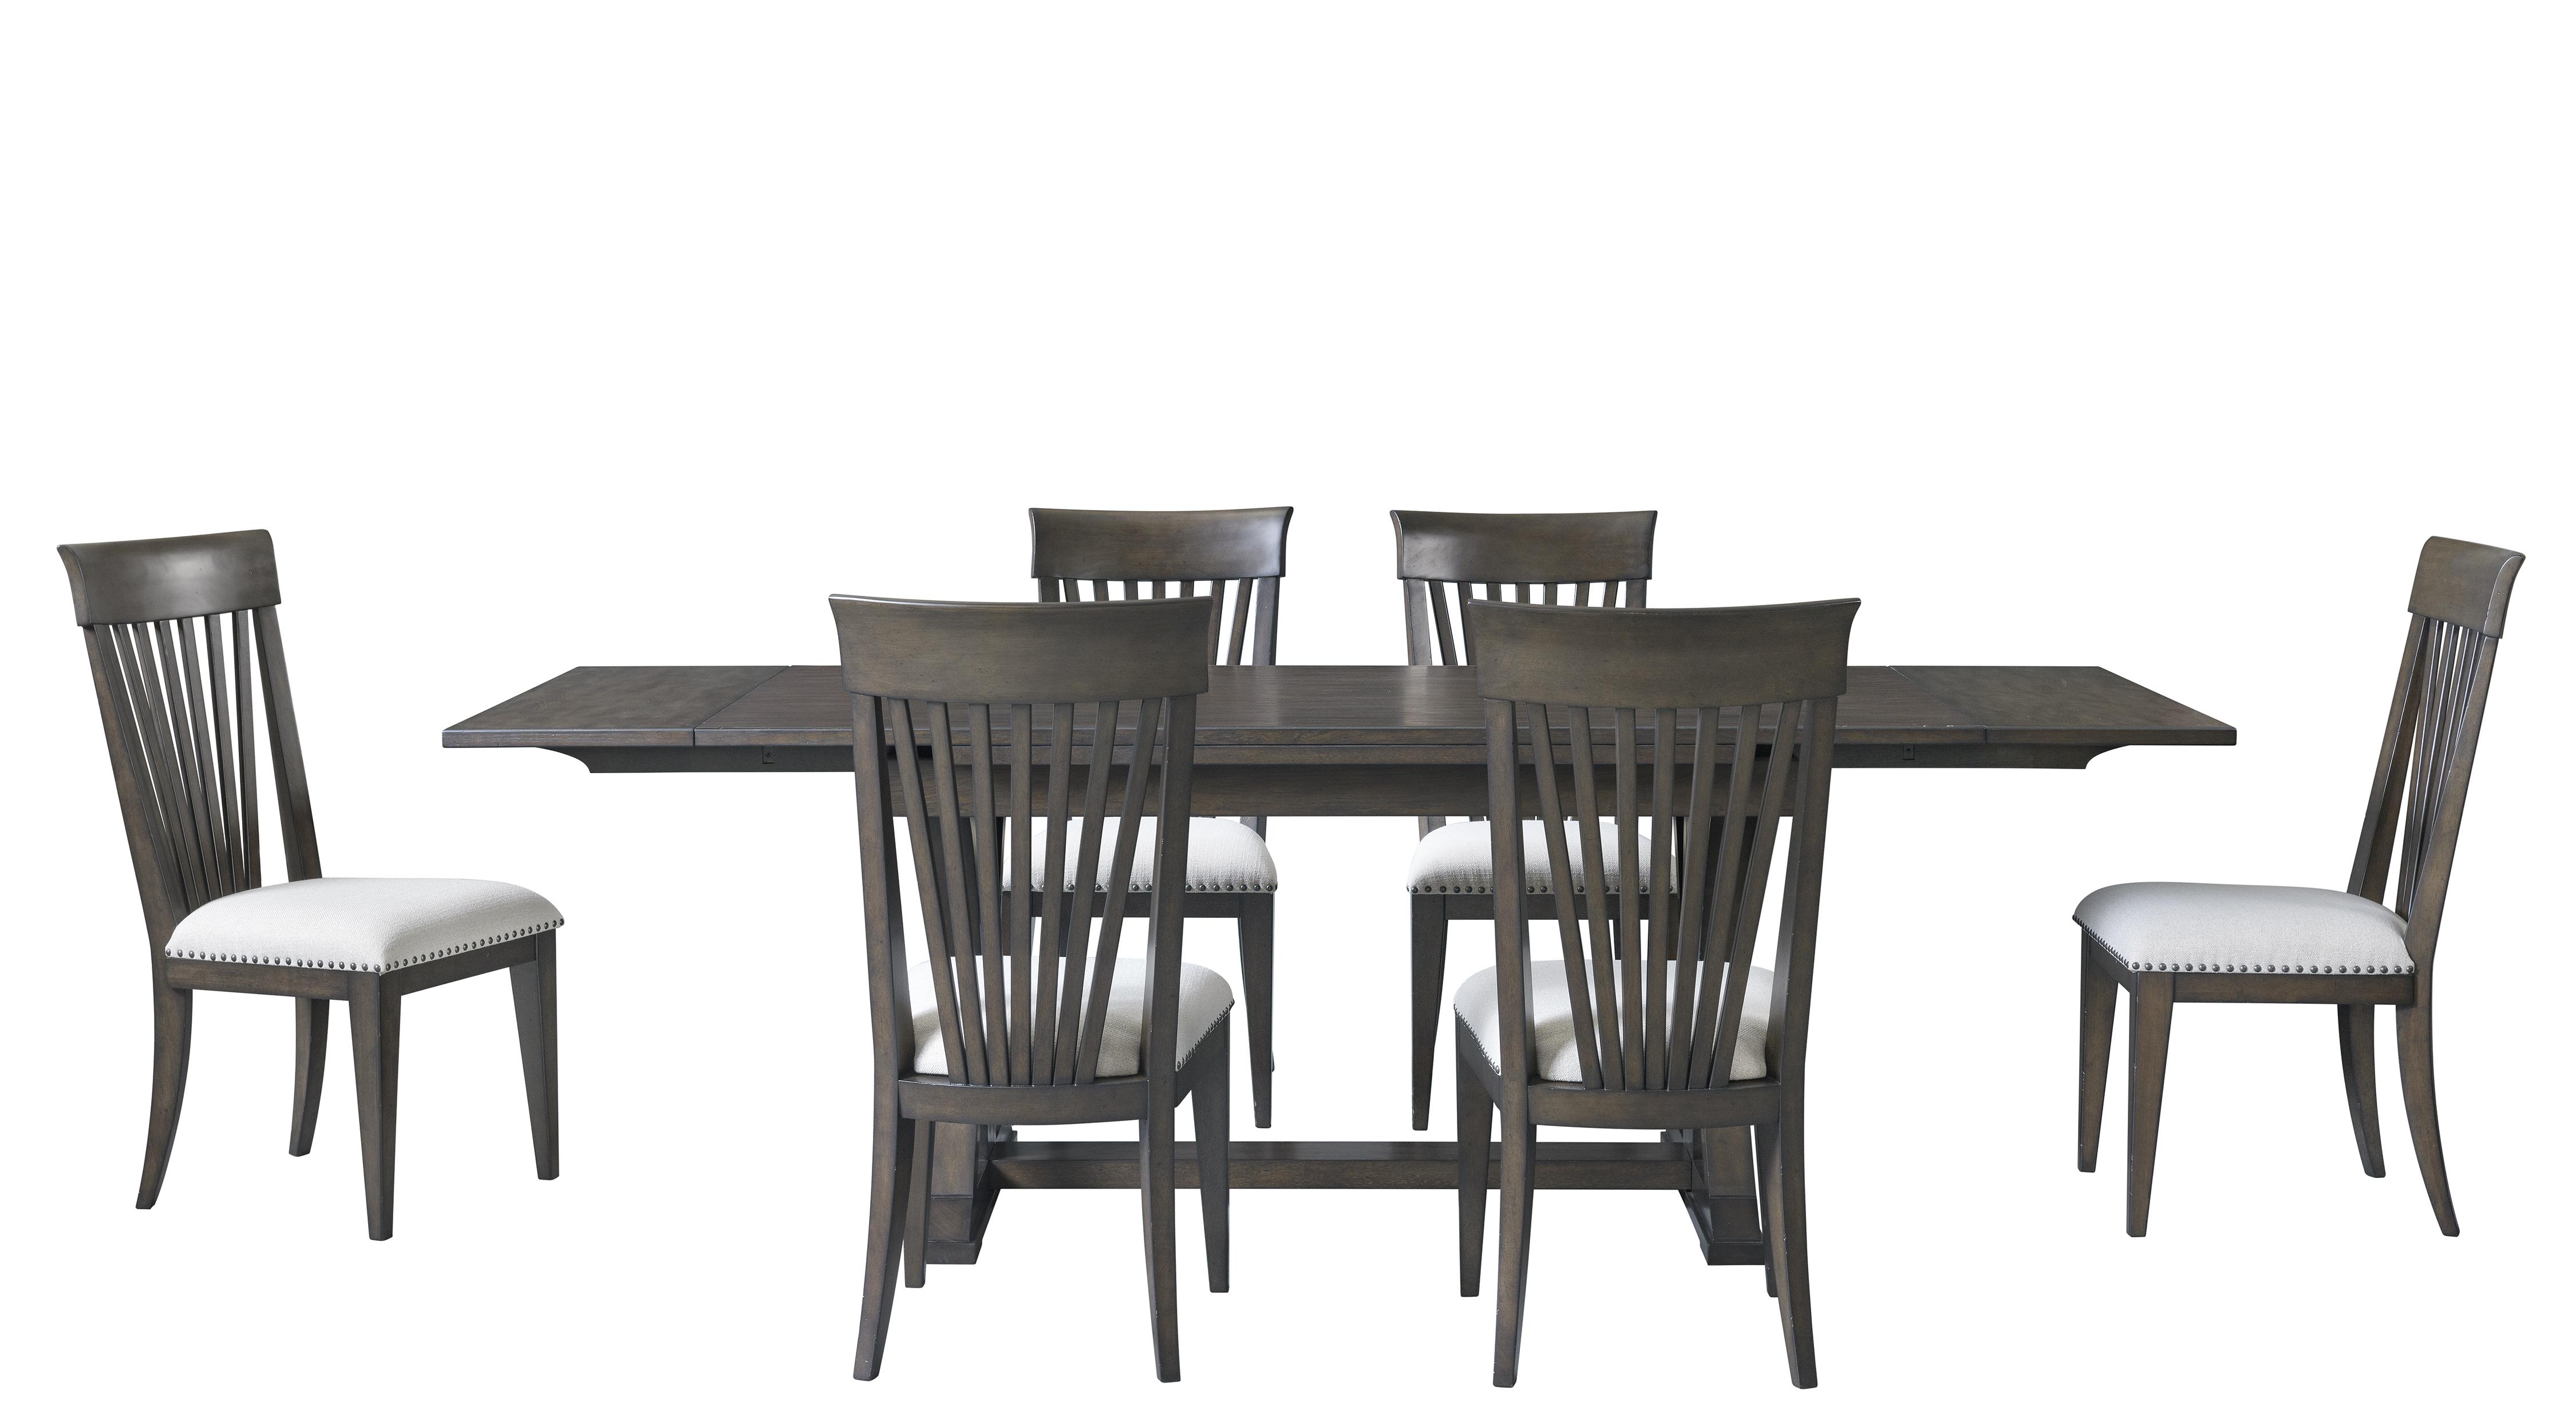 Forsyth 7-Piece Dining Set by Riverside Furniture at Nassau Furniture and Mattress